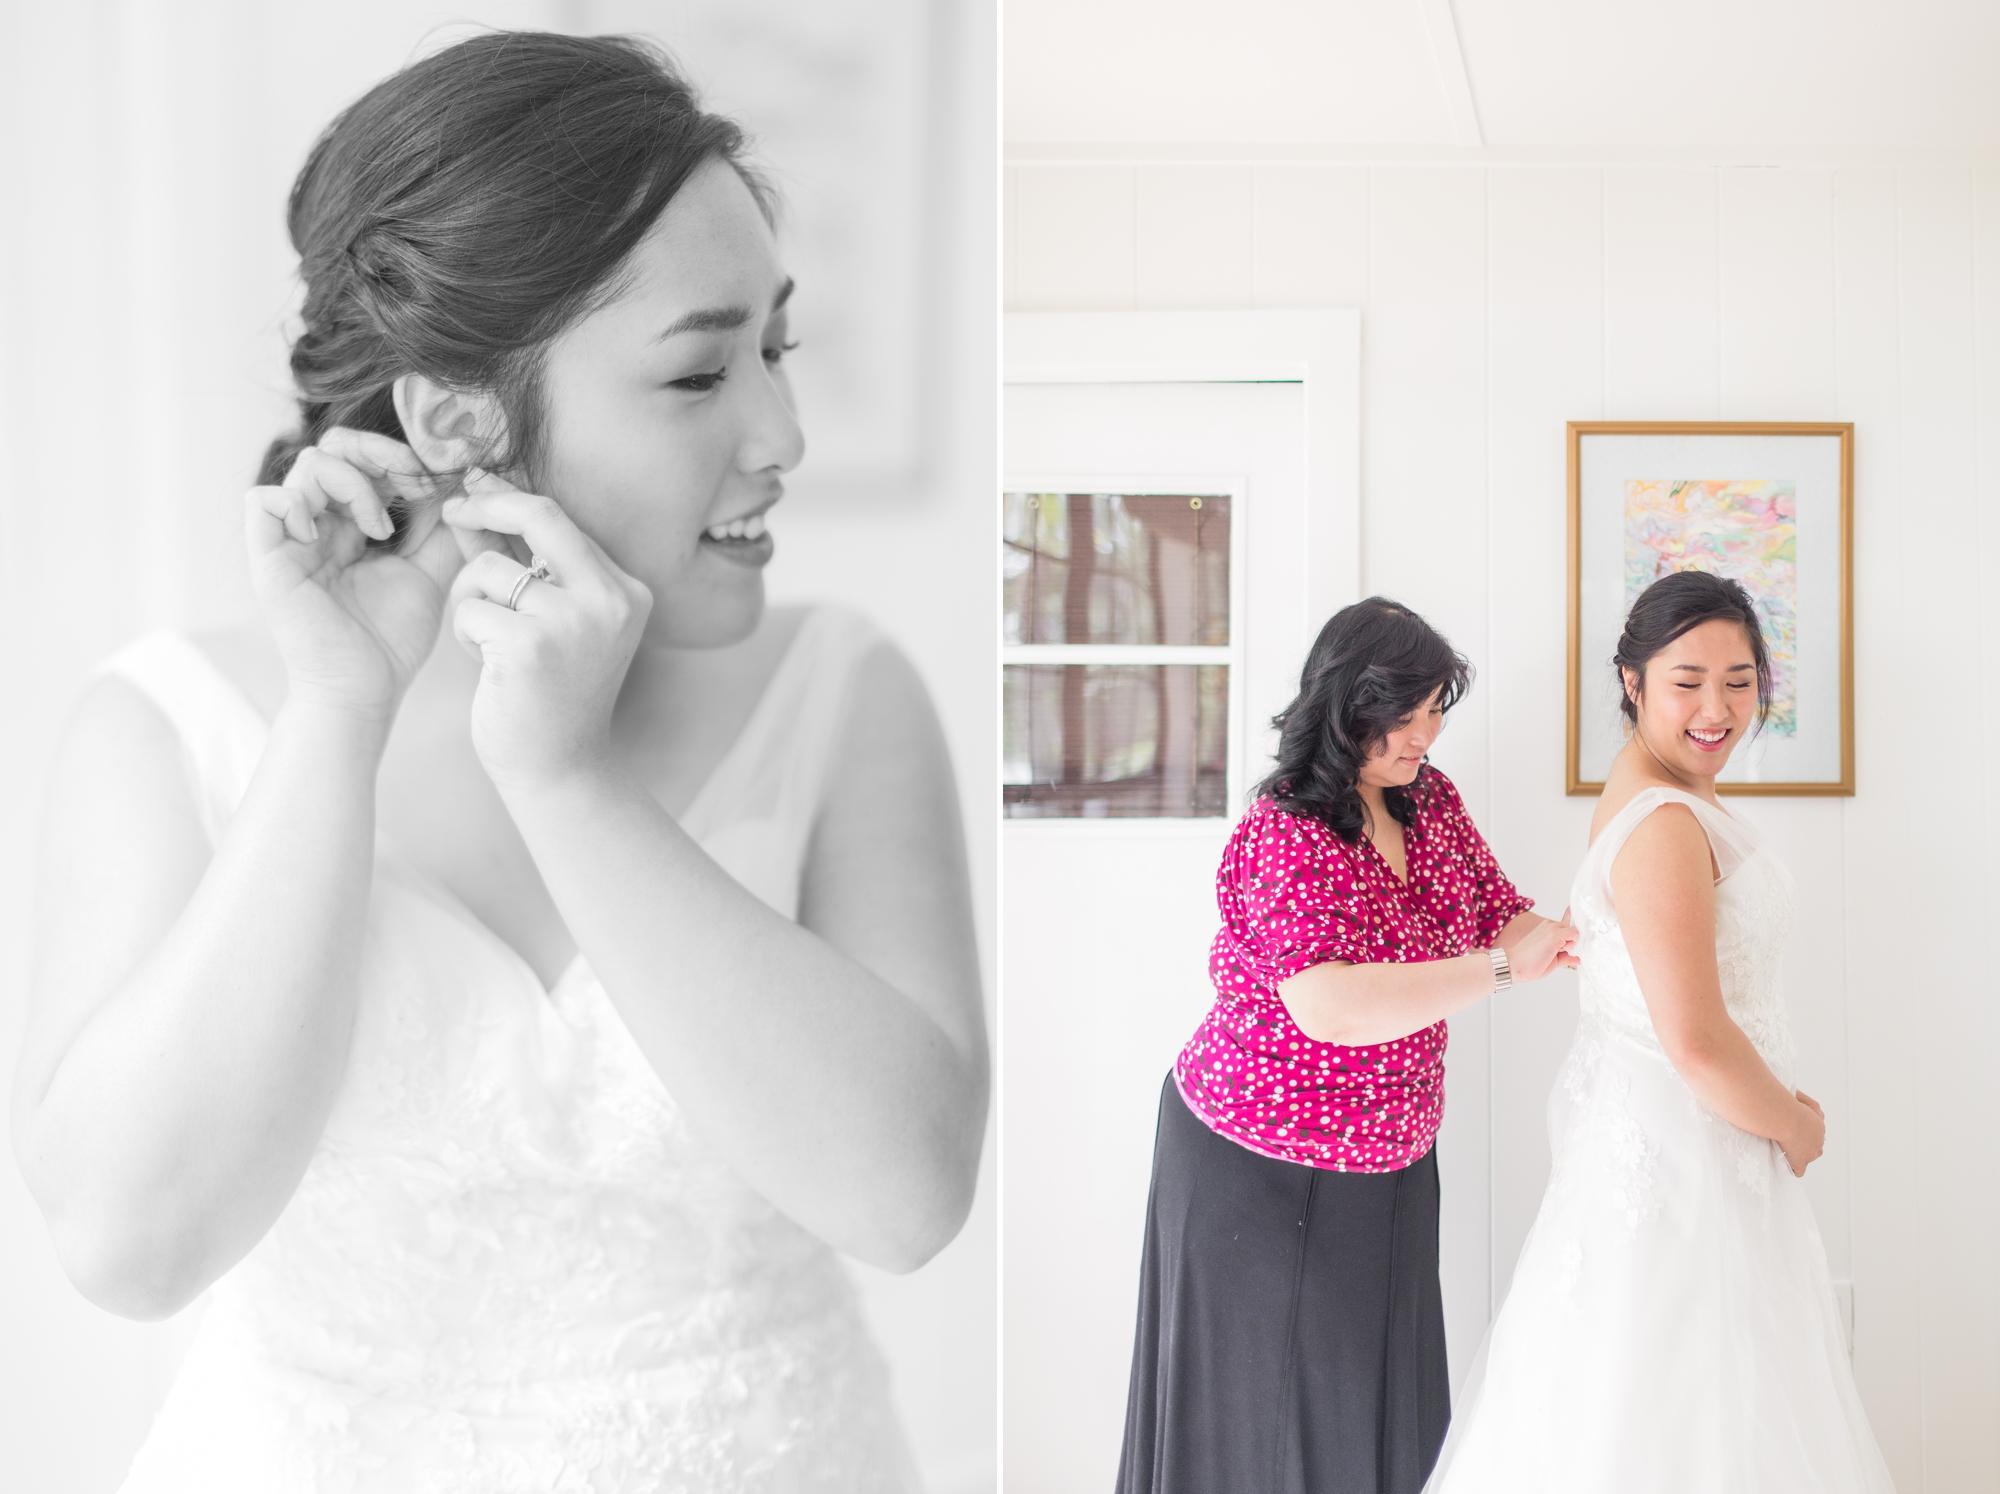 giles wedding blog 8.jpg